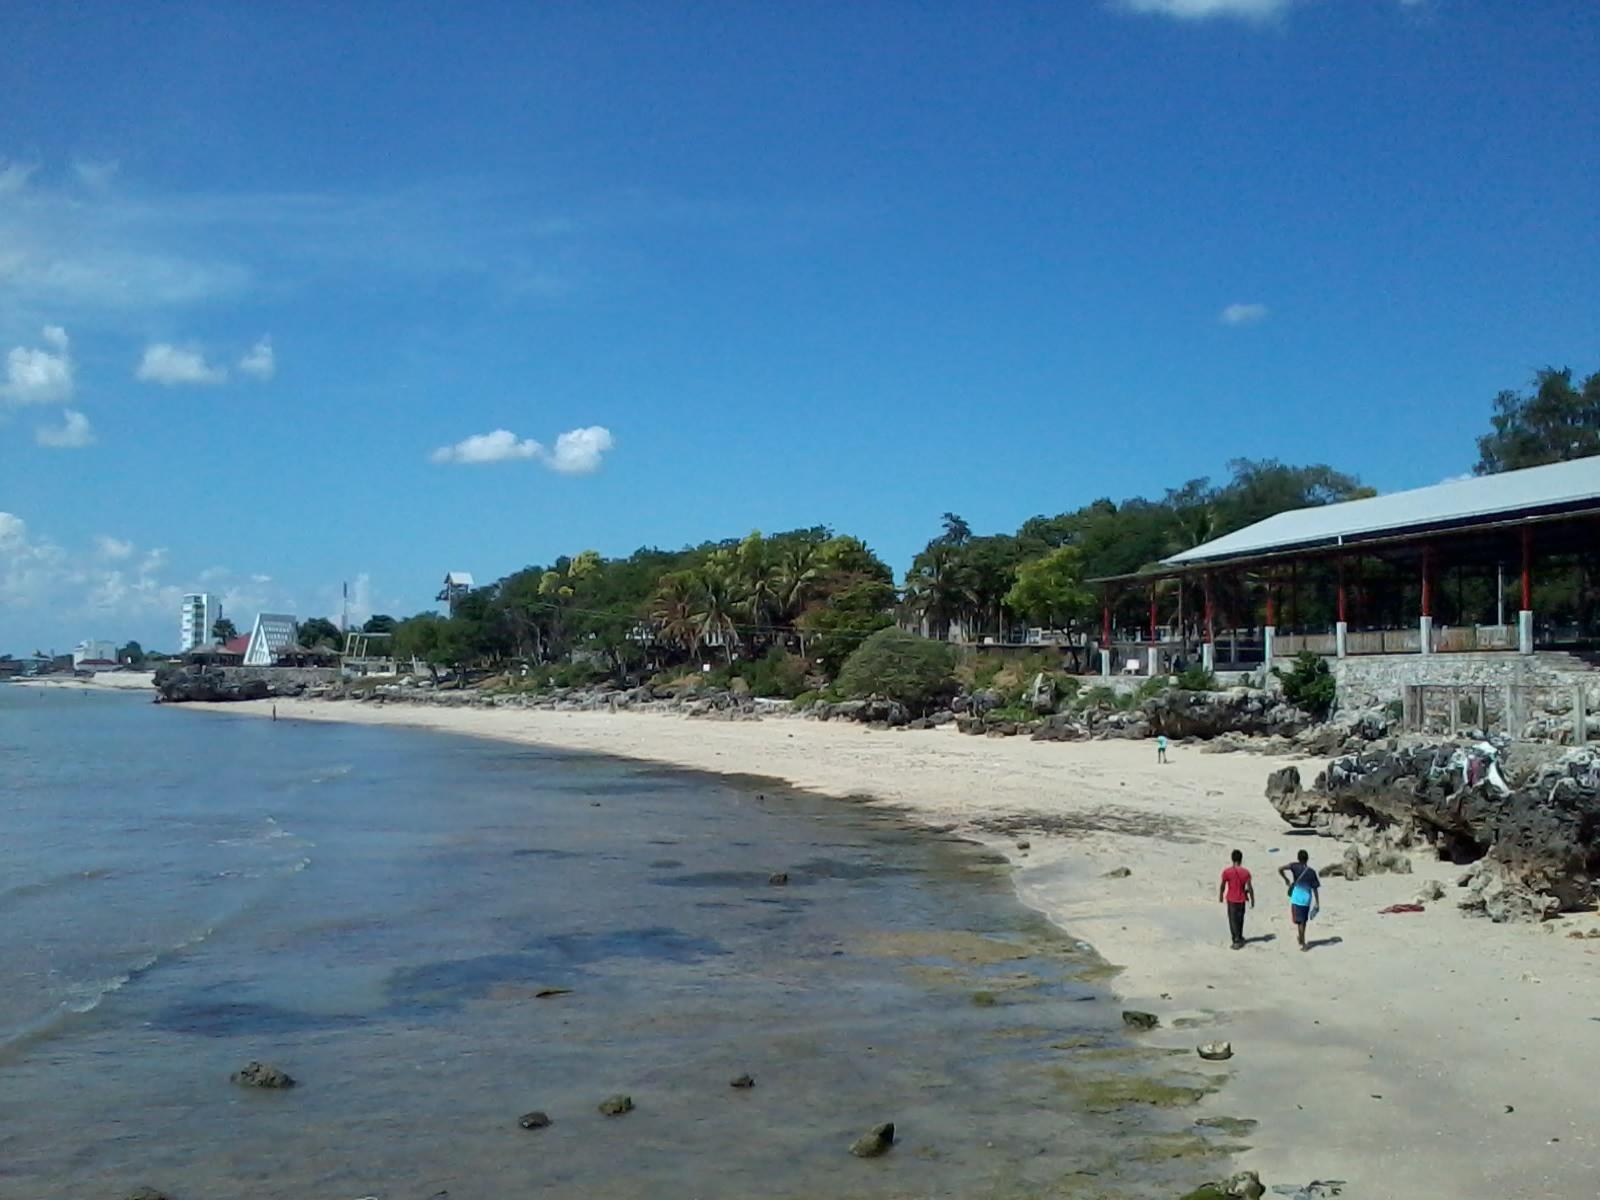 Tempat Wisata Kupang Wajib Kamu Datangi 687708 Menjelajah Pantai Neam